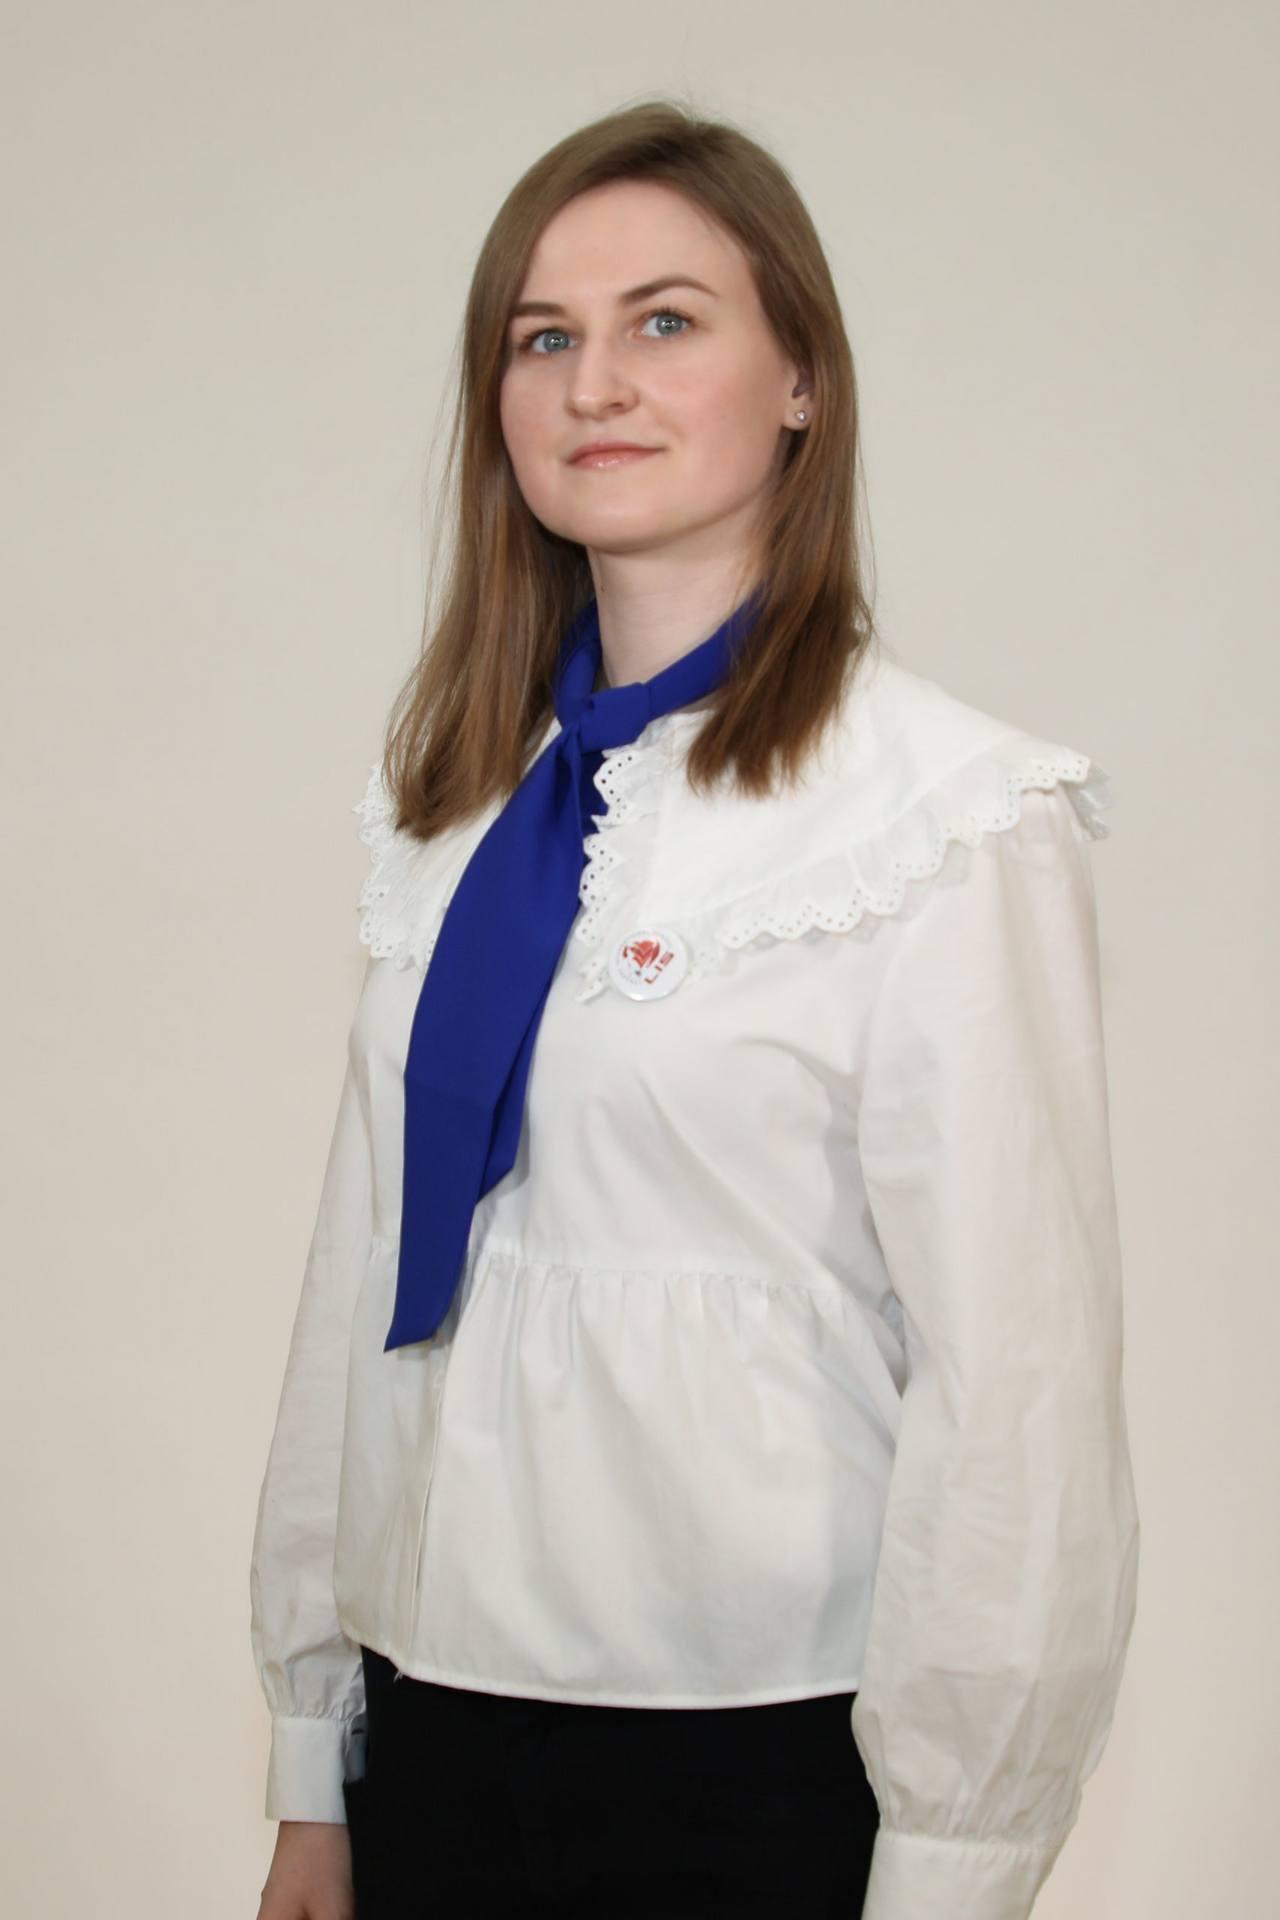 Стеценко Маргарита Александровна